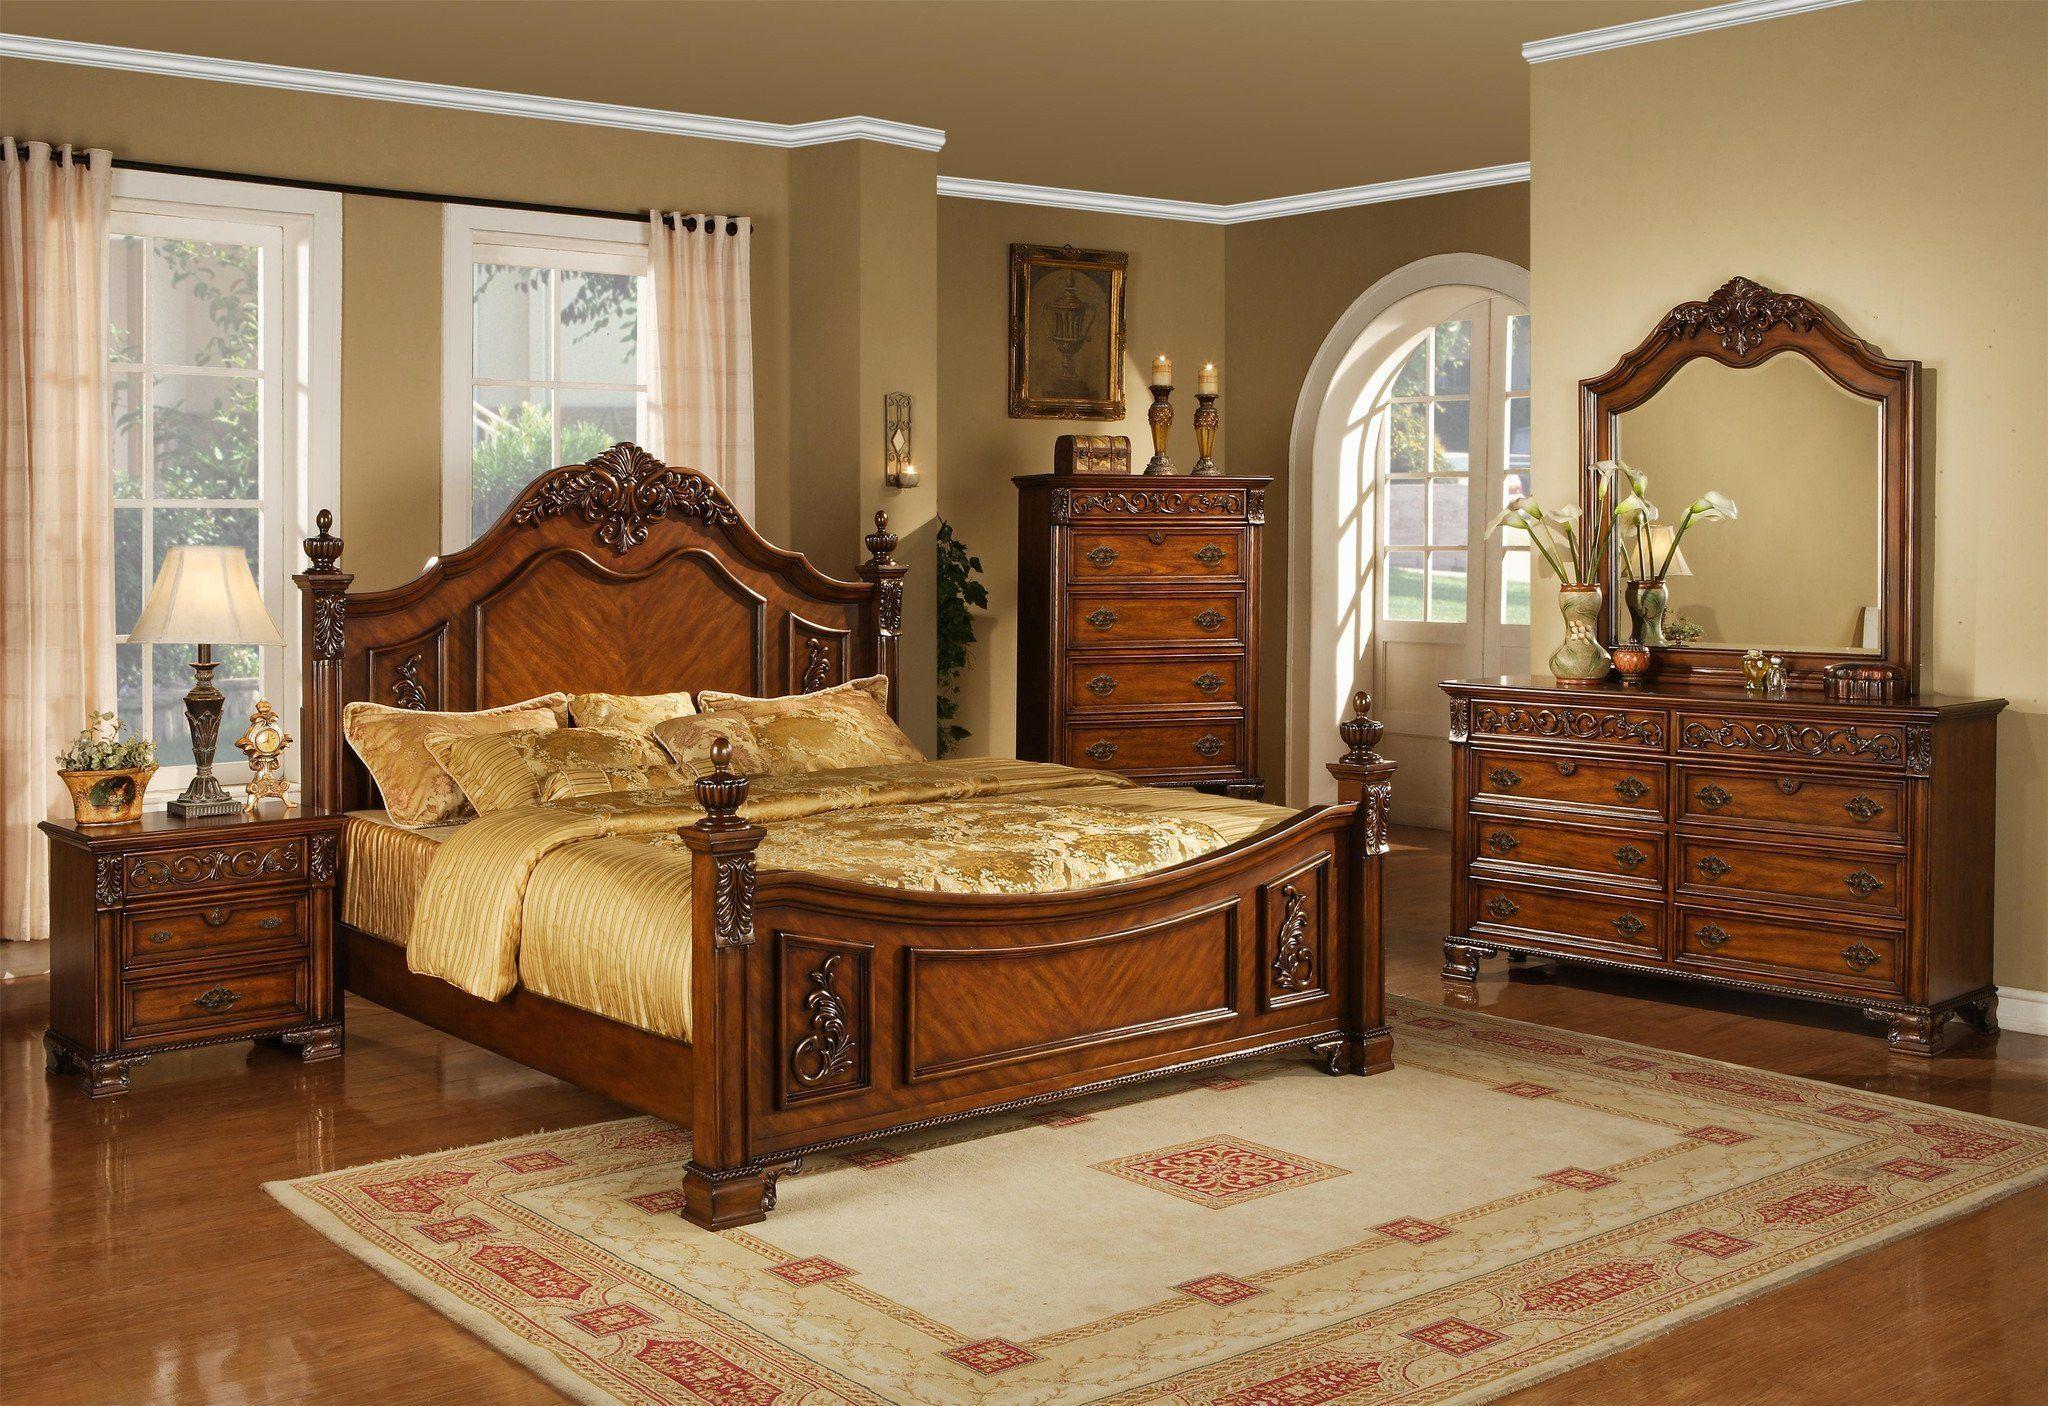 Lifestyle b mansion cherry queen bedroom set interiores